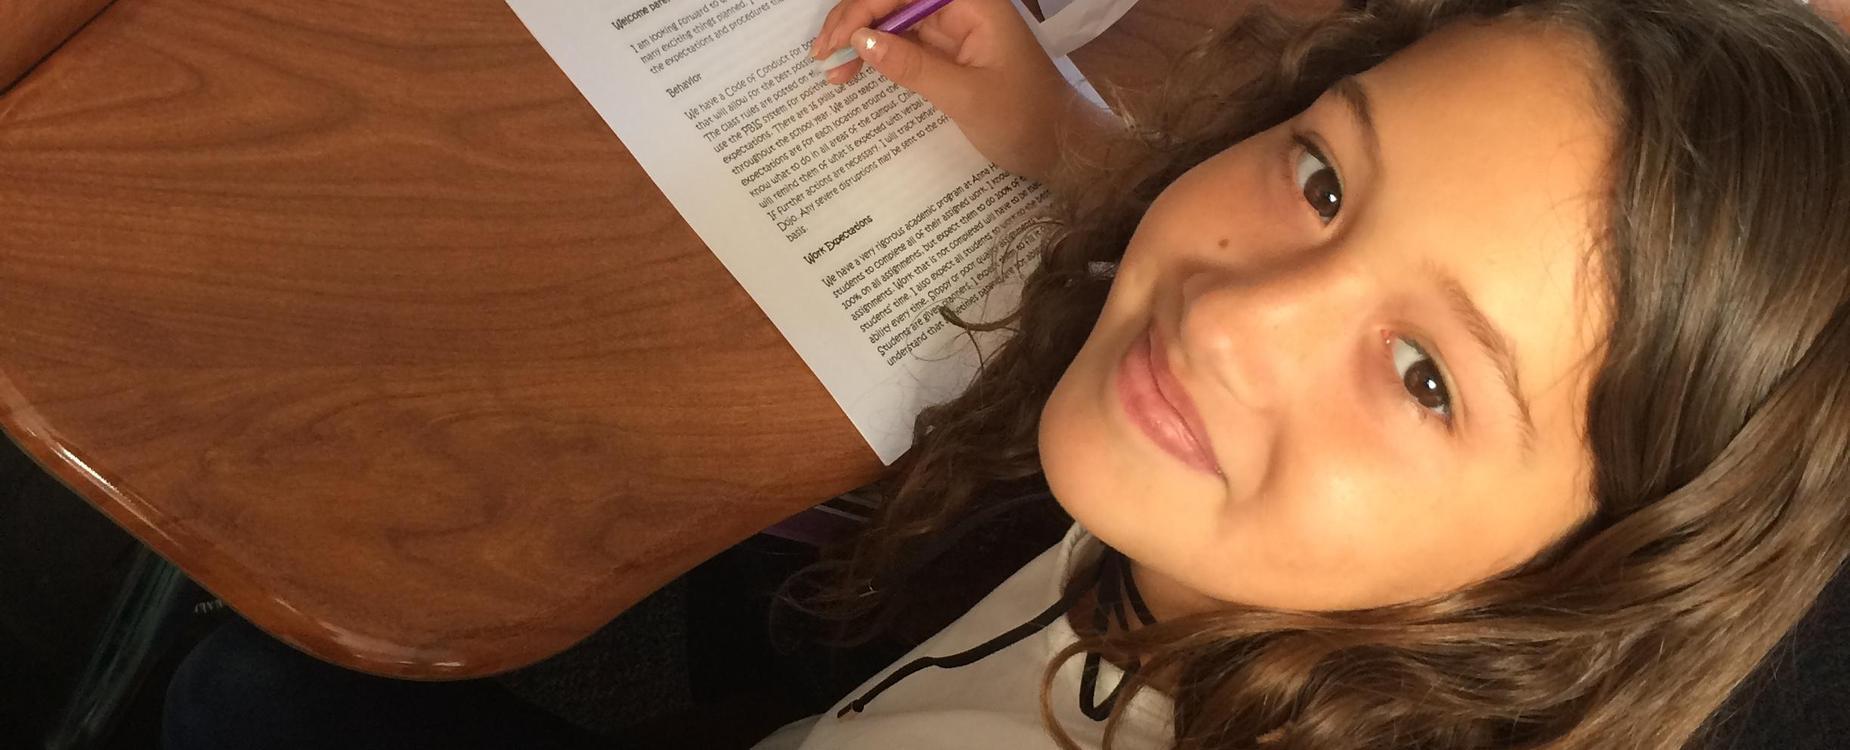 student finishing classwork